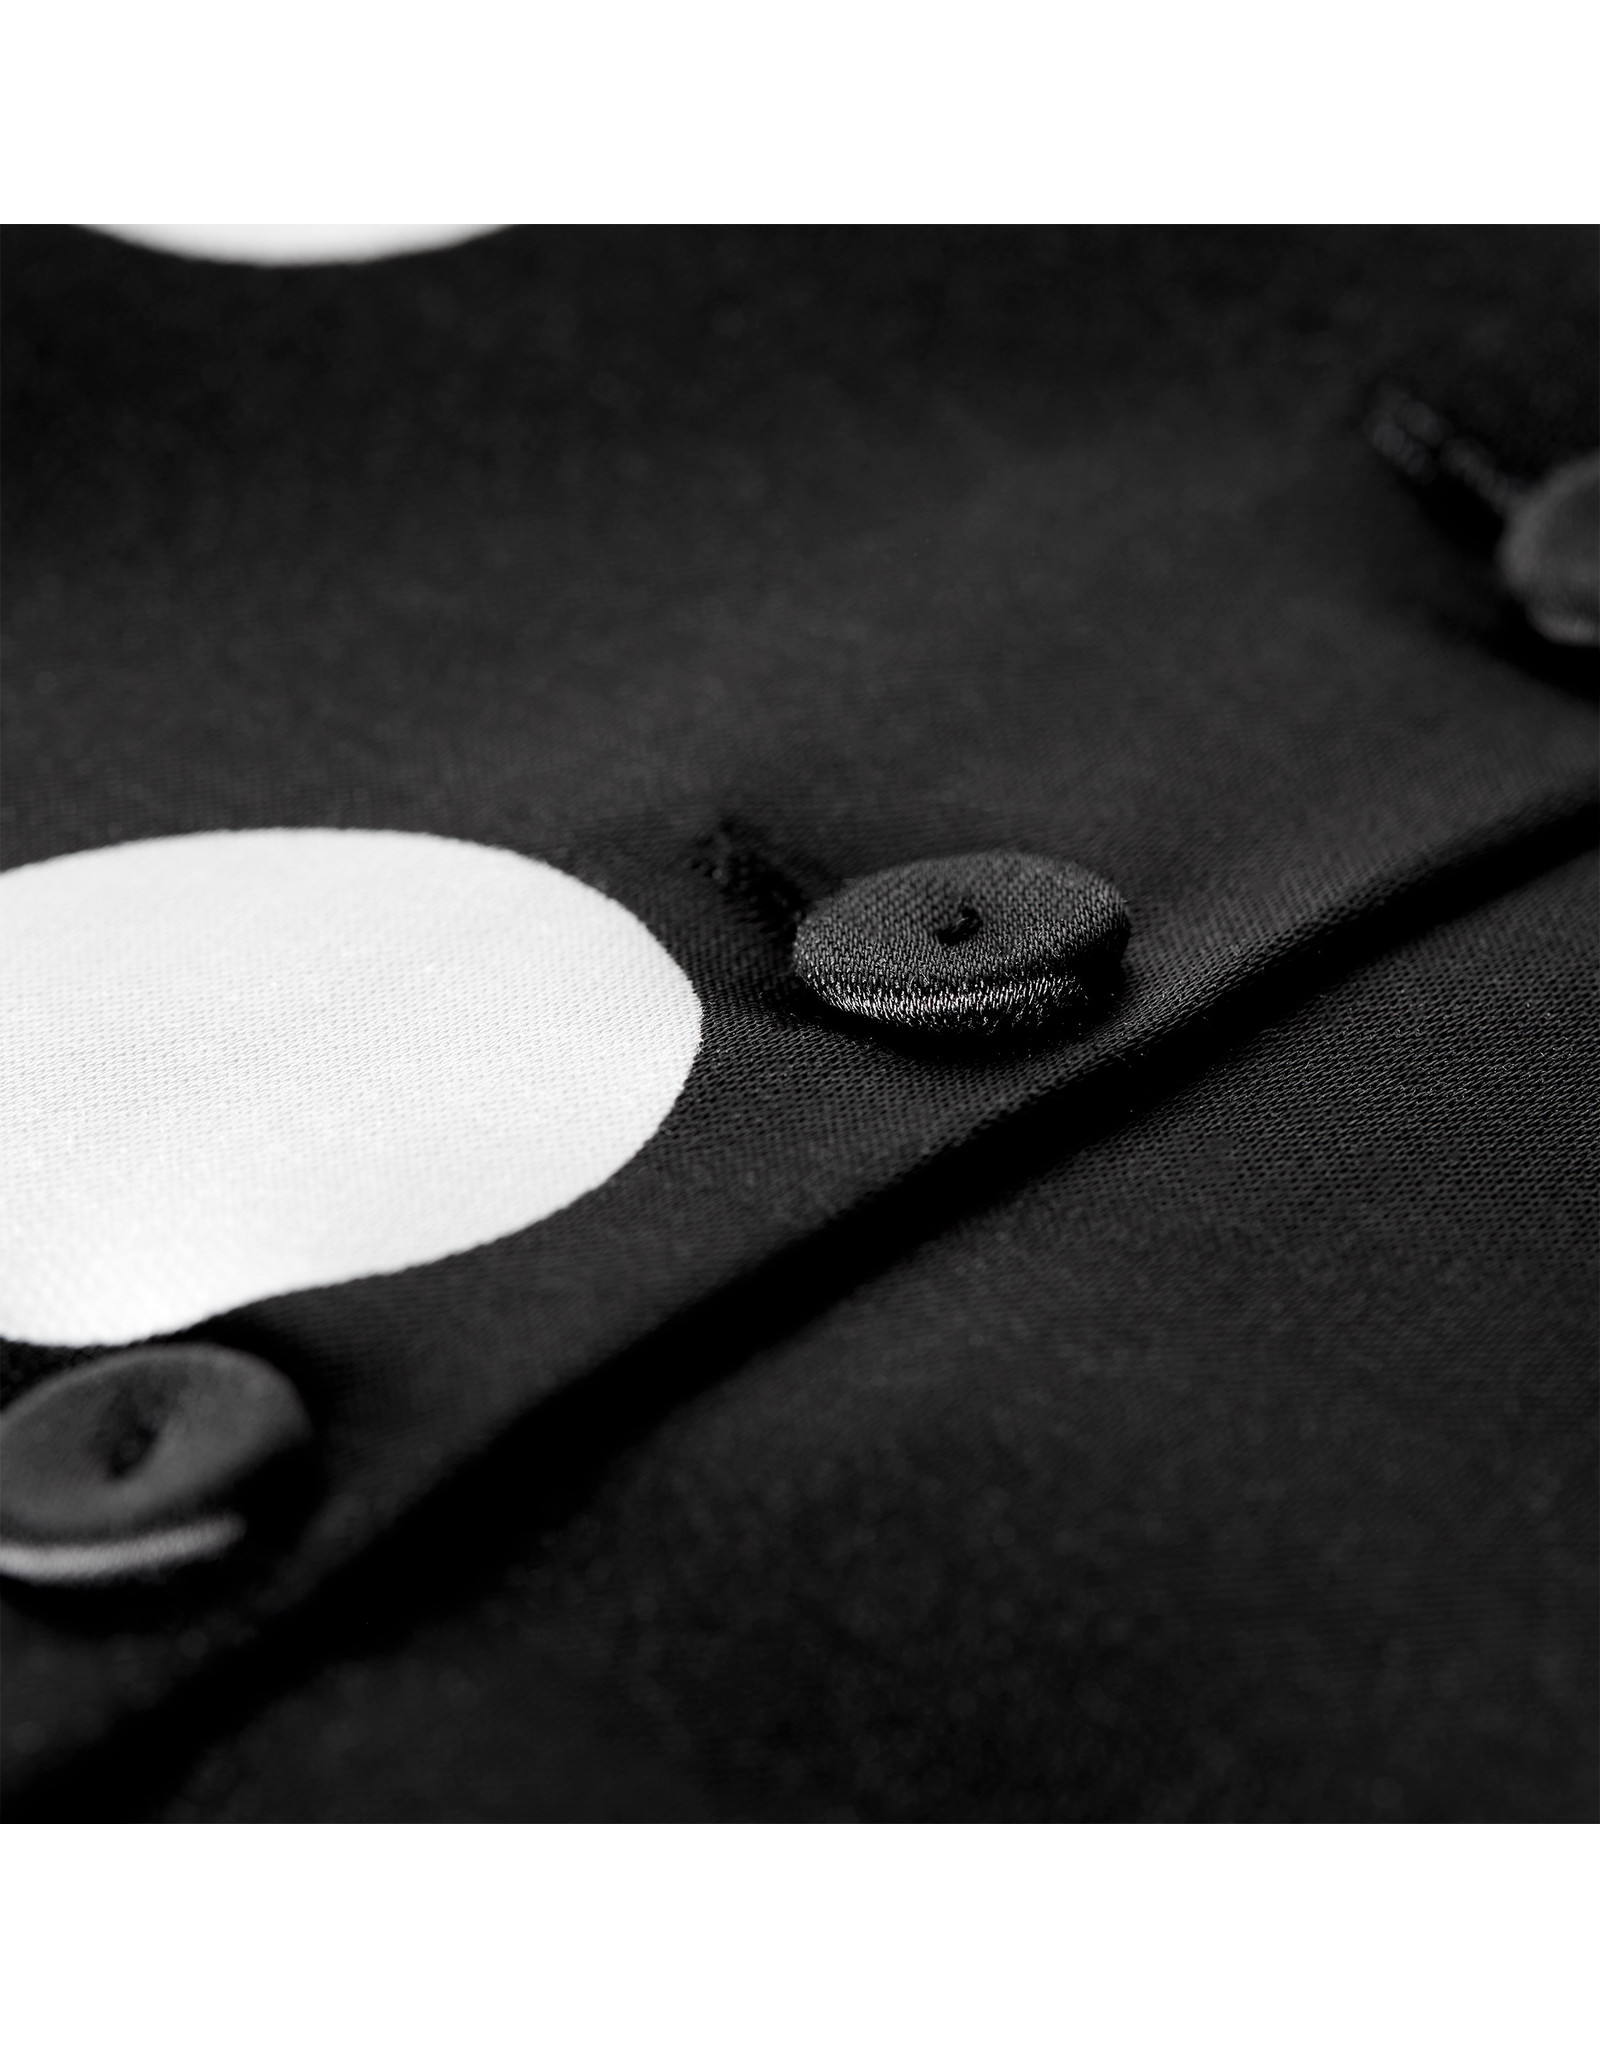 G. Label Devin Crop Top (Color: Black/White Dot Print, Size: 6)